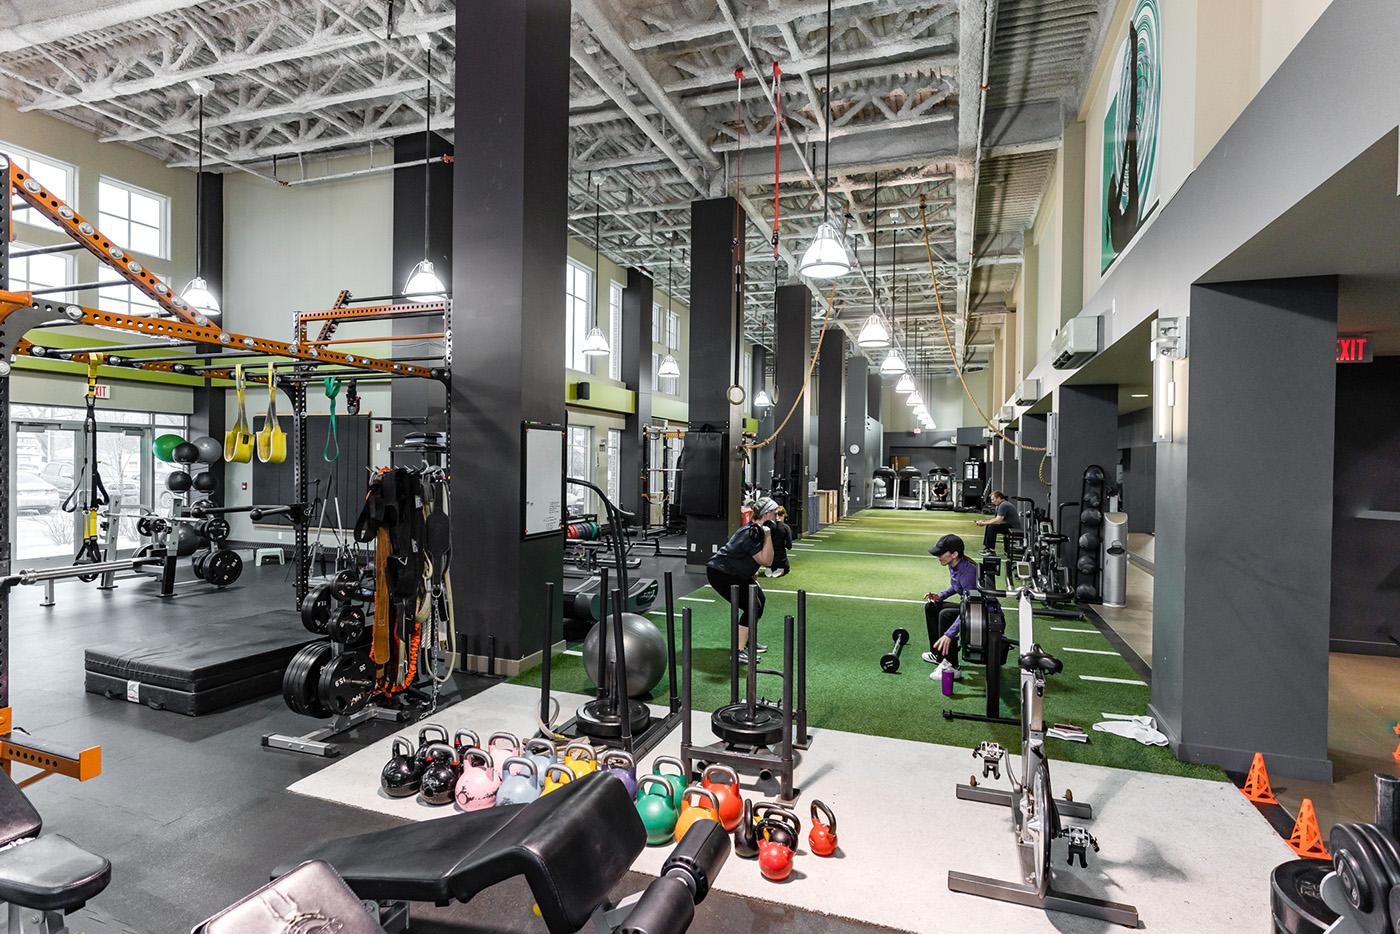 cityfit-gym-personal-training-calgary-workout-facility-inglewood-17.jpg